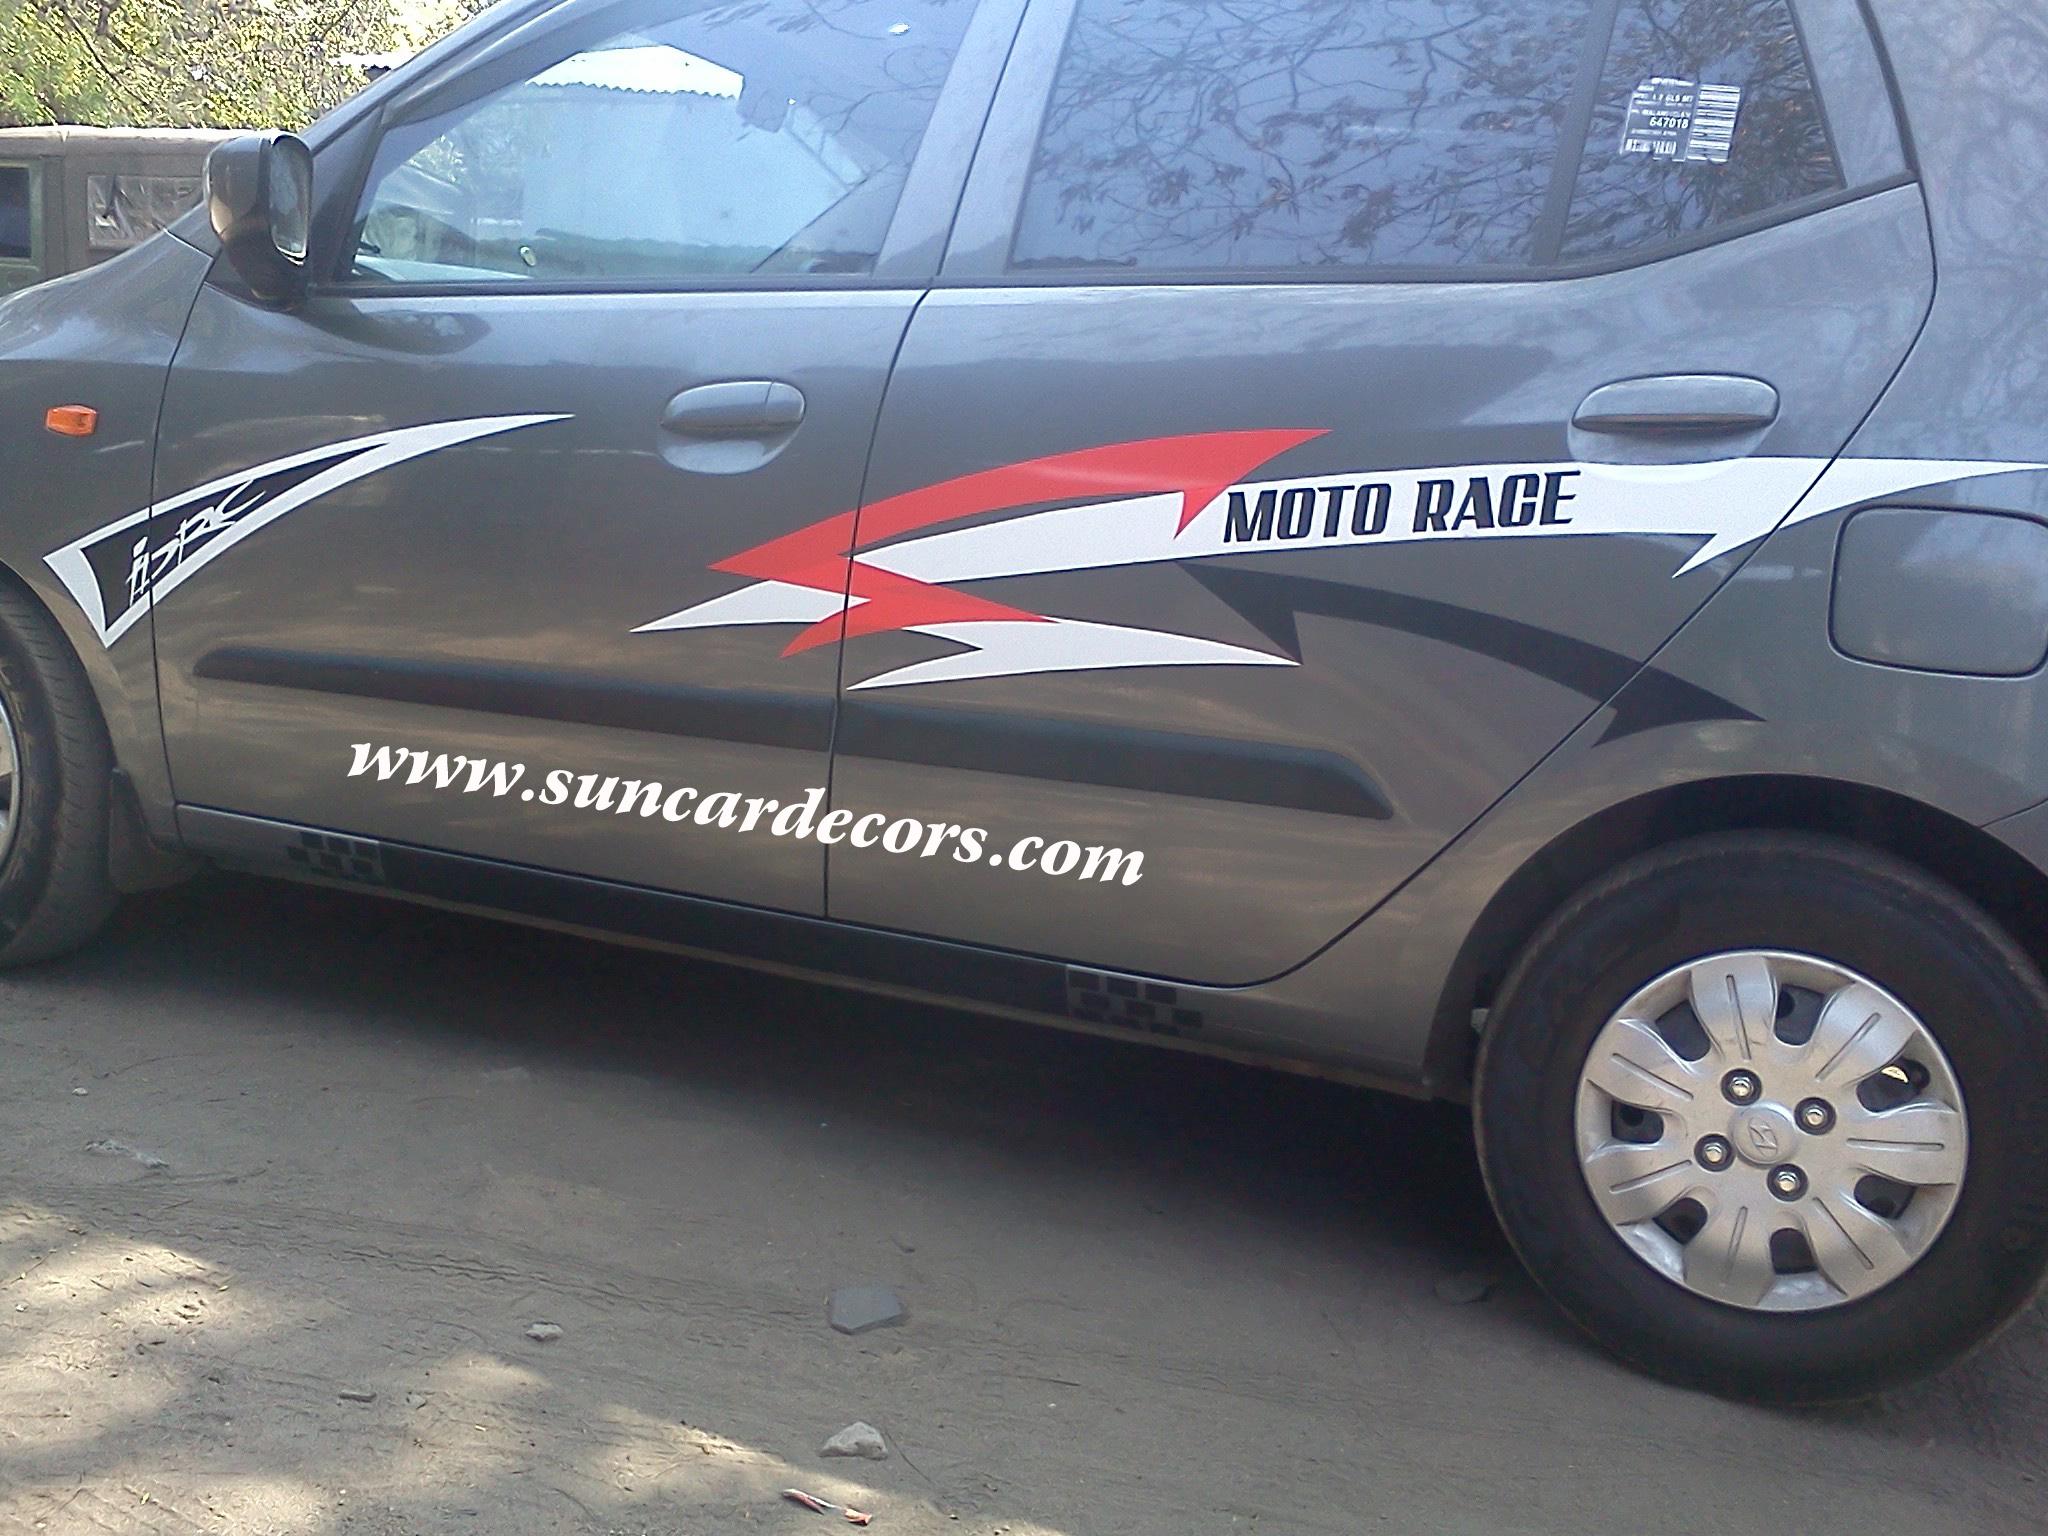 Car stickers design in coimbatore - Car Stickering